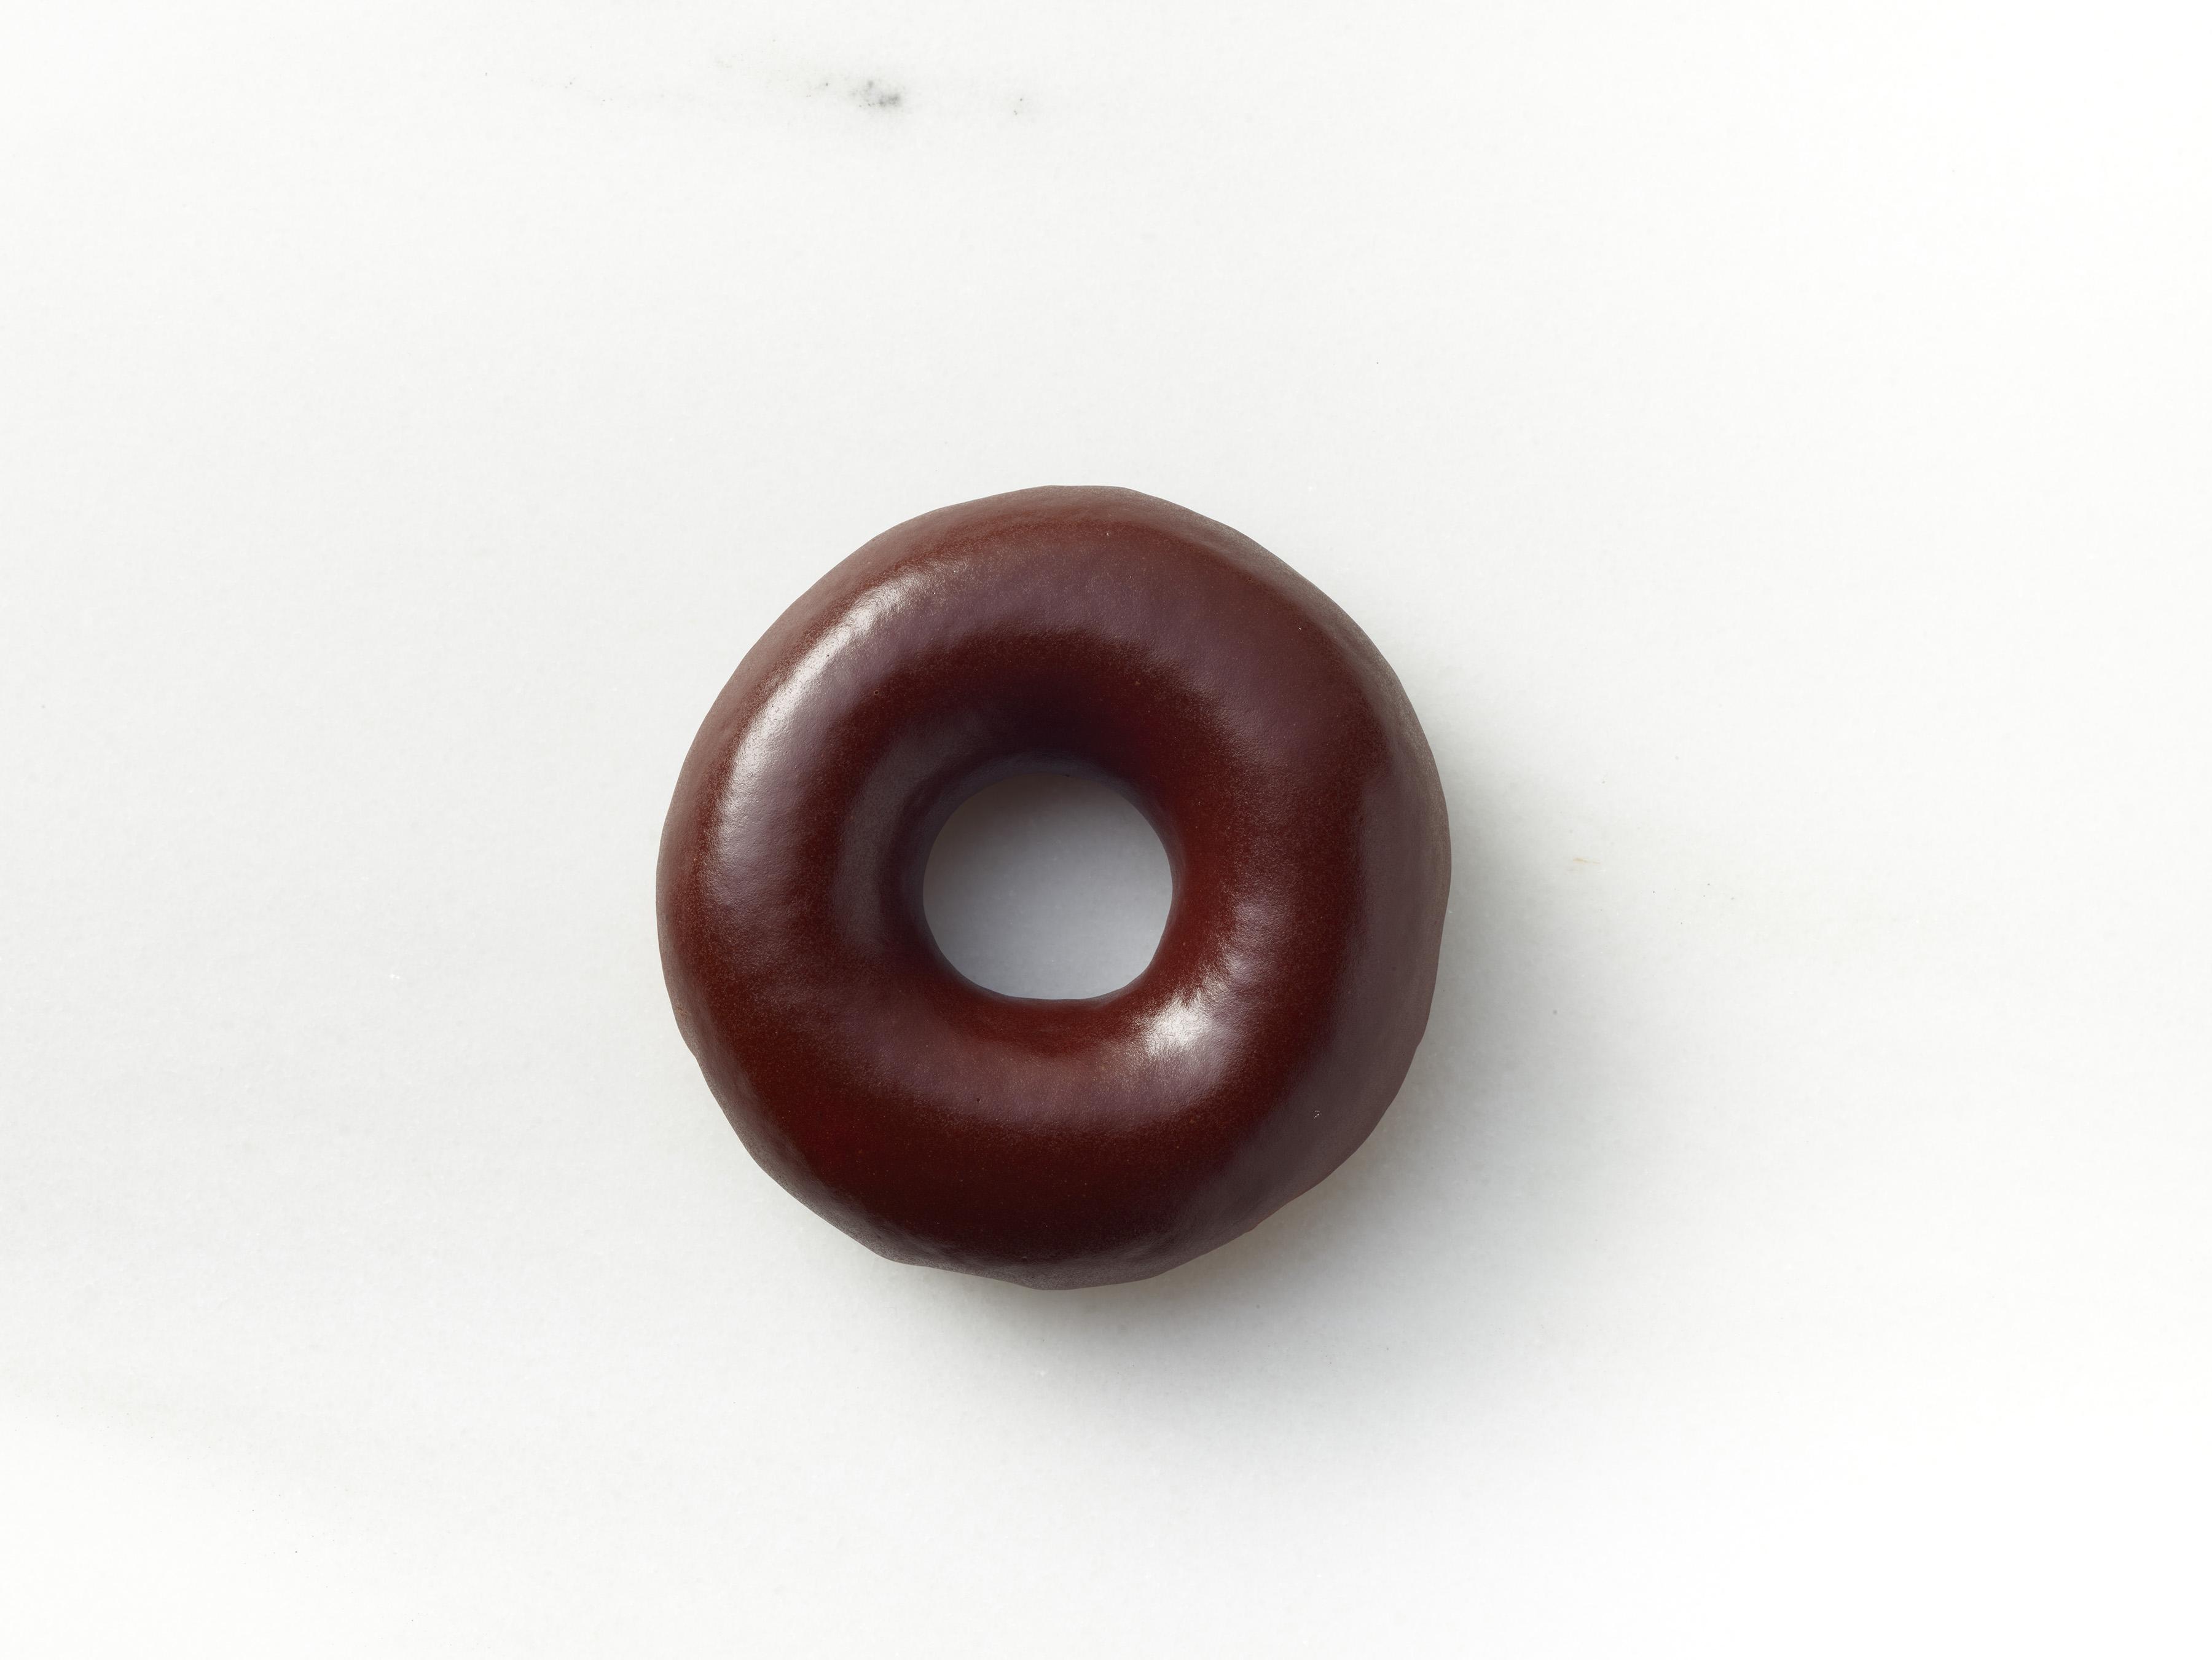 The new chocolate glazed doughnut.